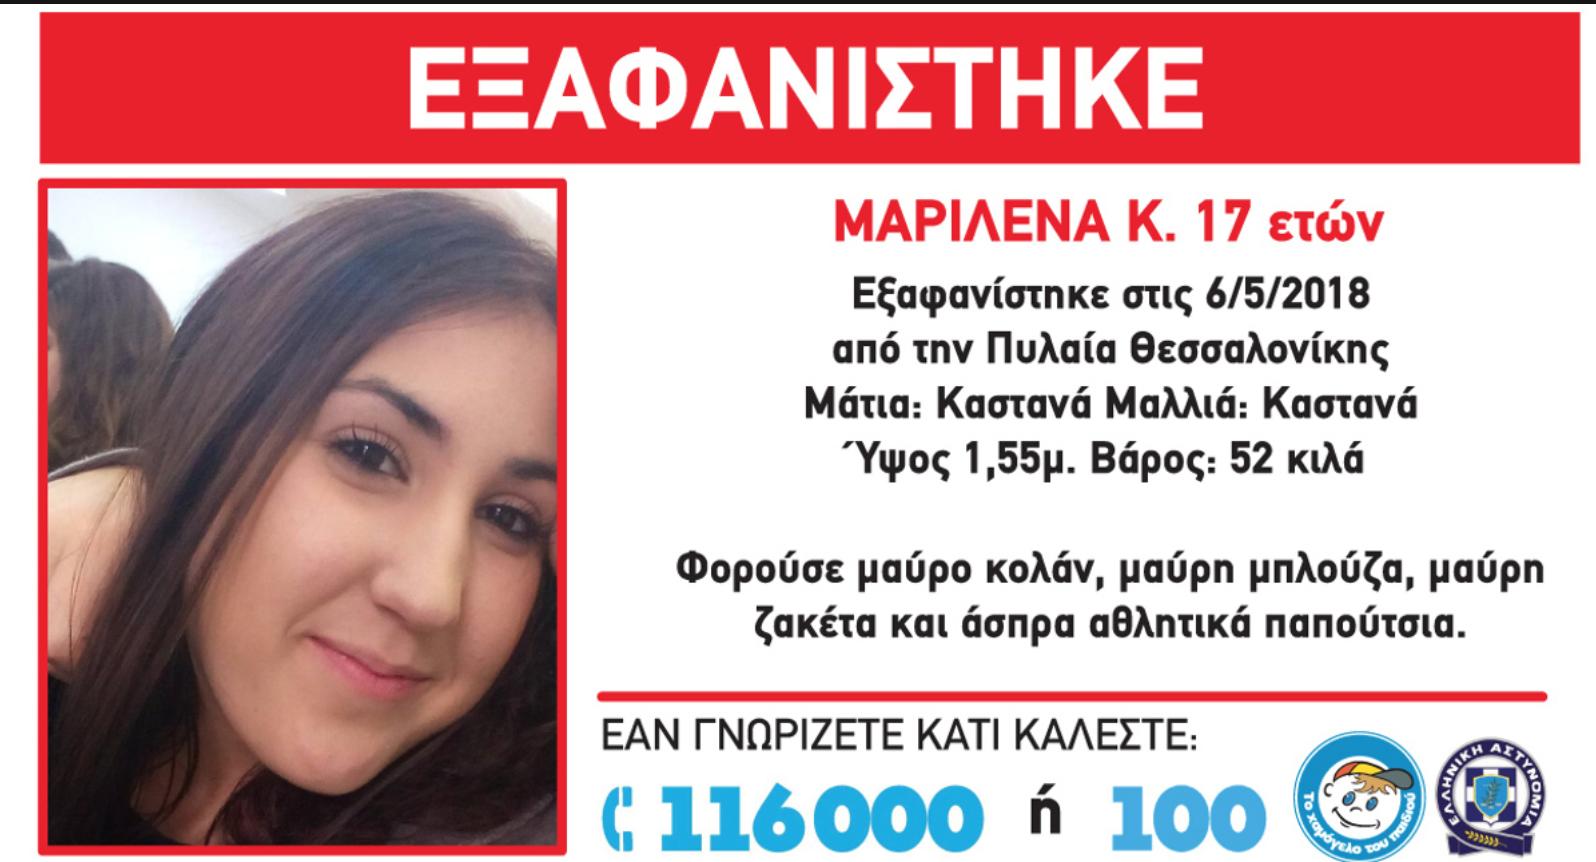 "e7ac32fd3a6 Ένα κορίτσι 17 χρόνων εξαφανίστηκε χθες στην Πυλαία σύμφωνα με το ""Χαμόγελο  του Παιδιού""."